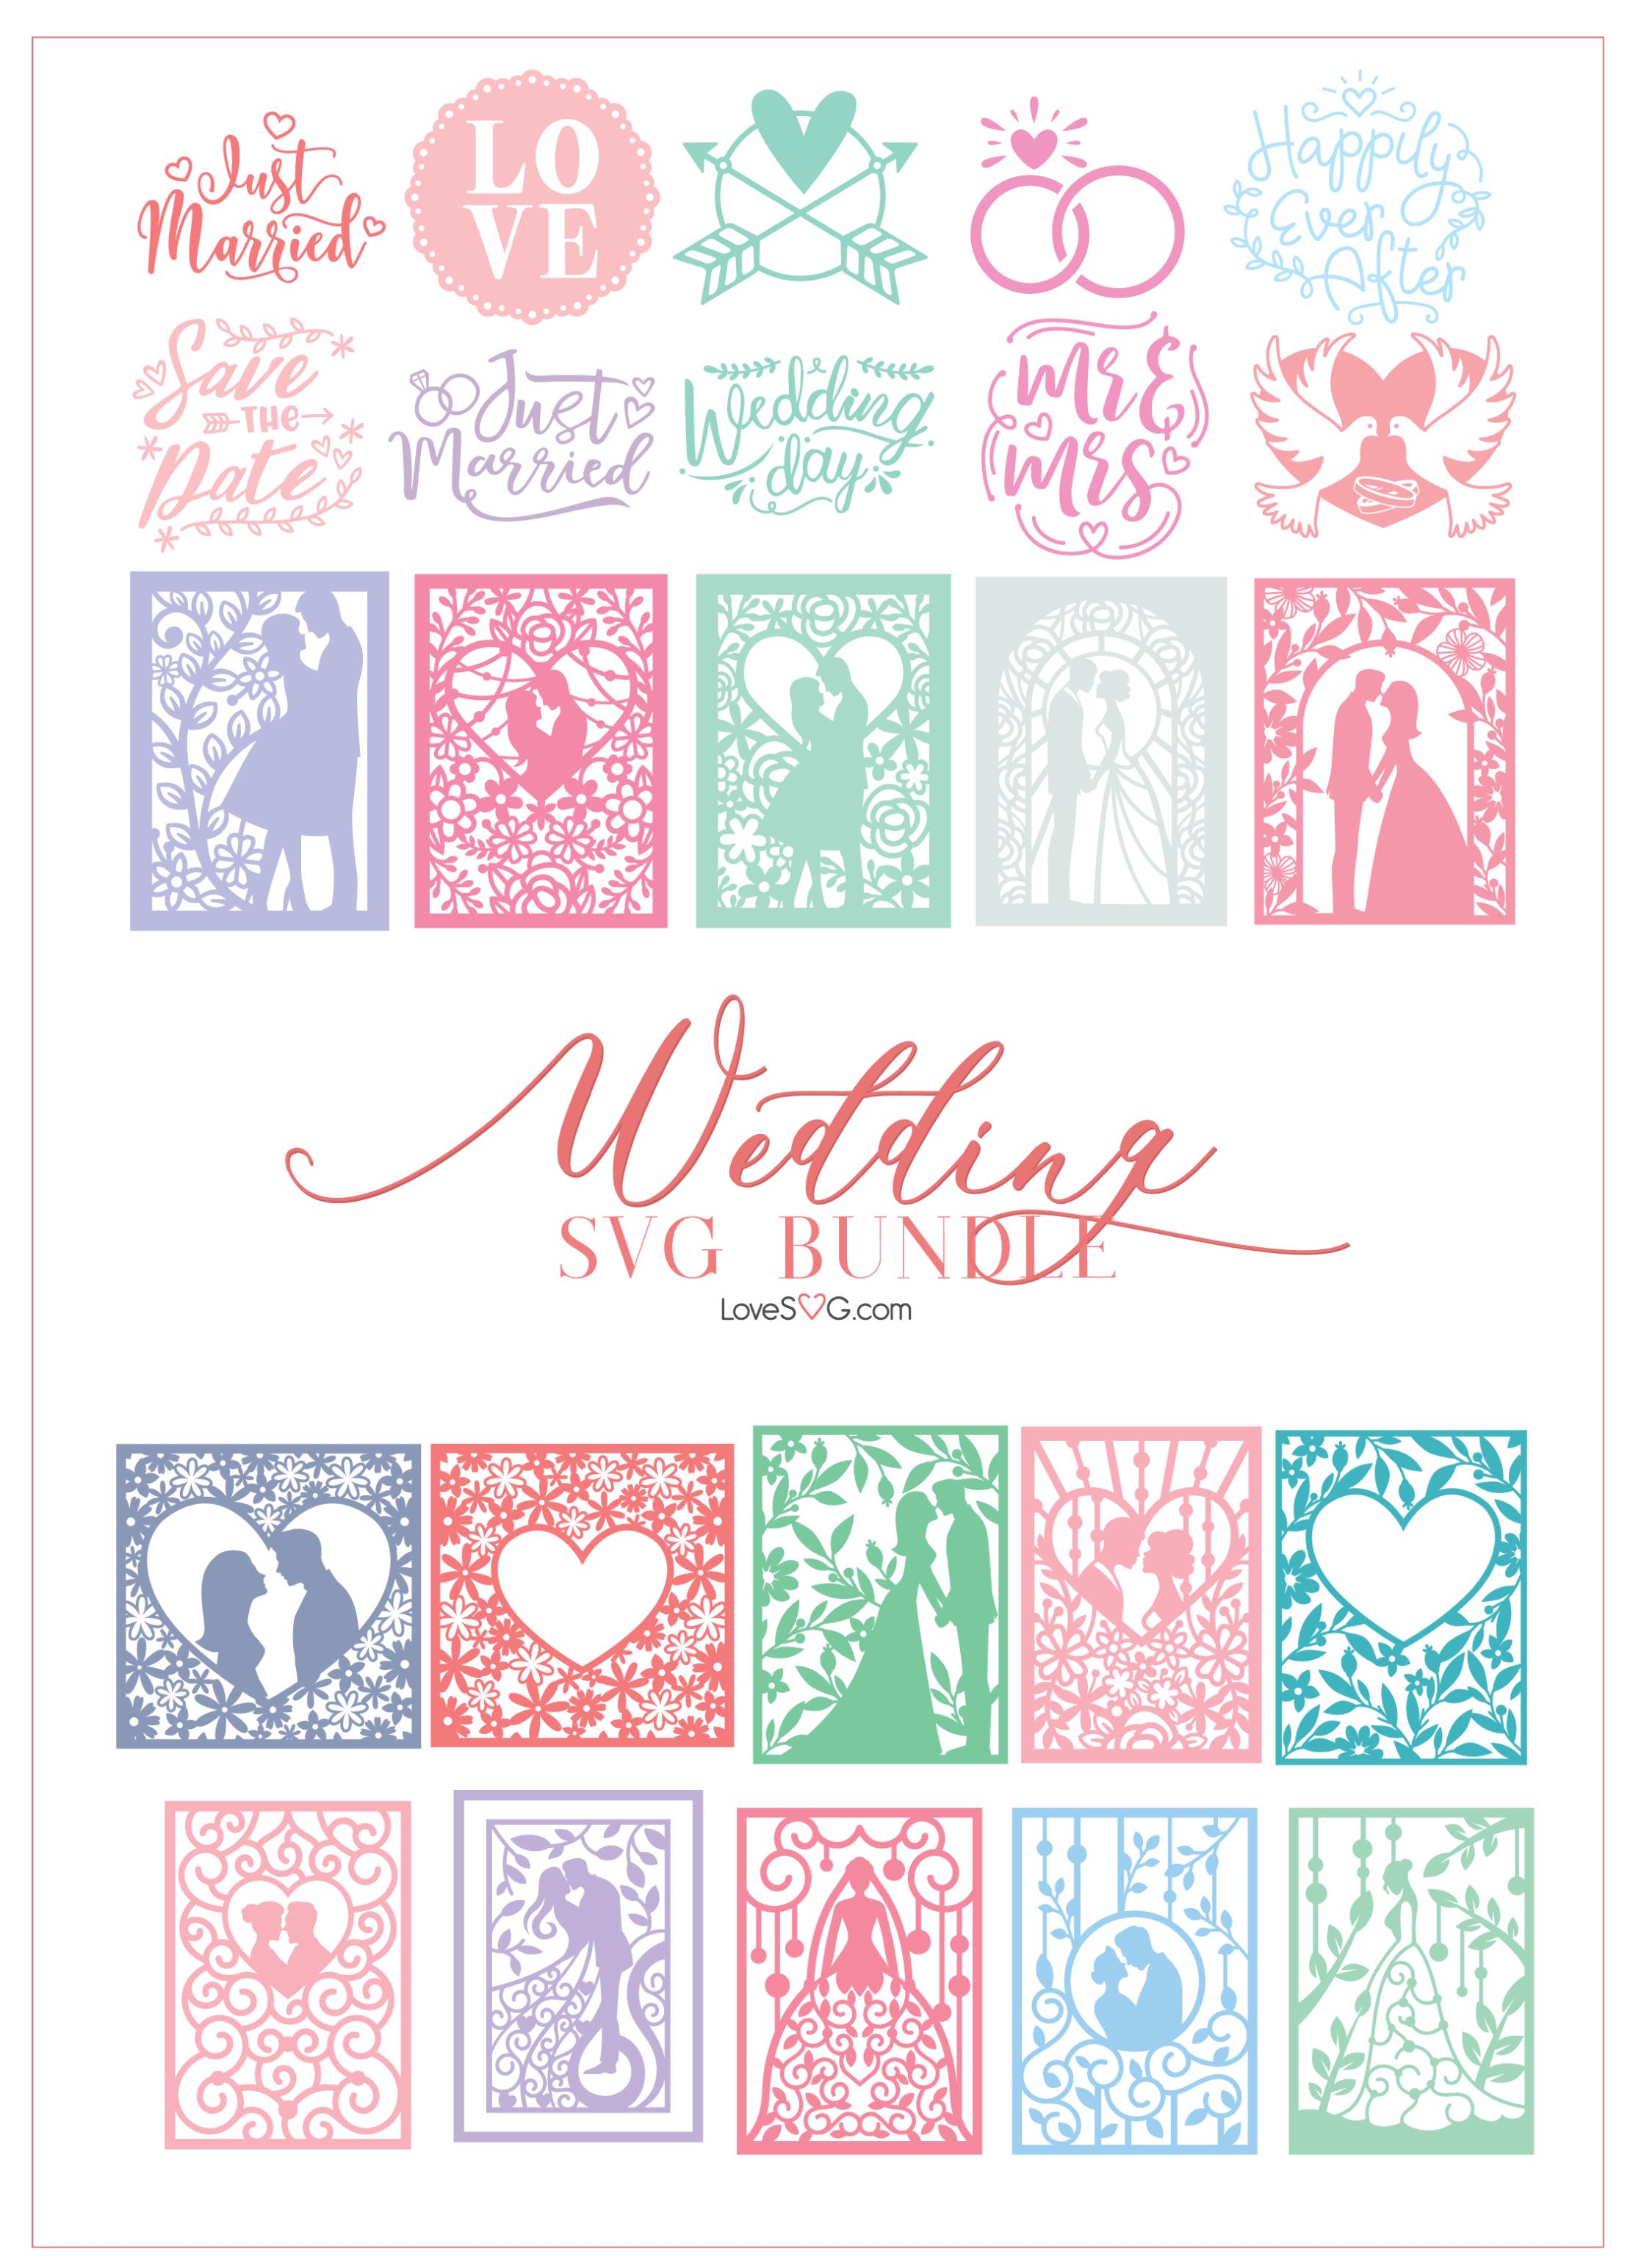 Download The Wedding SVG Bundle LoveSVG - Preview (4)   Cricut ...